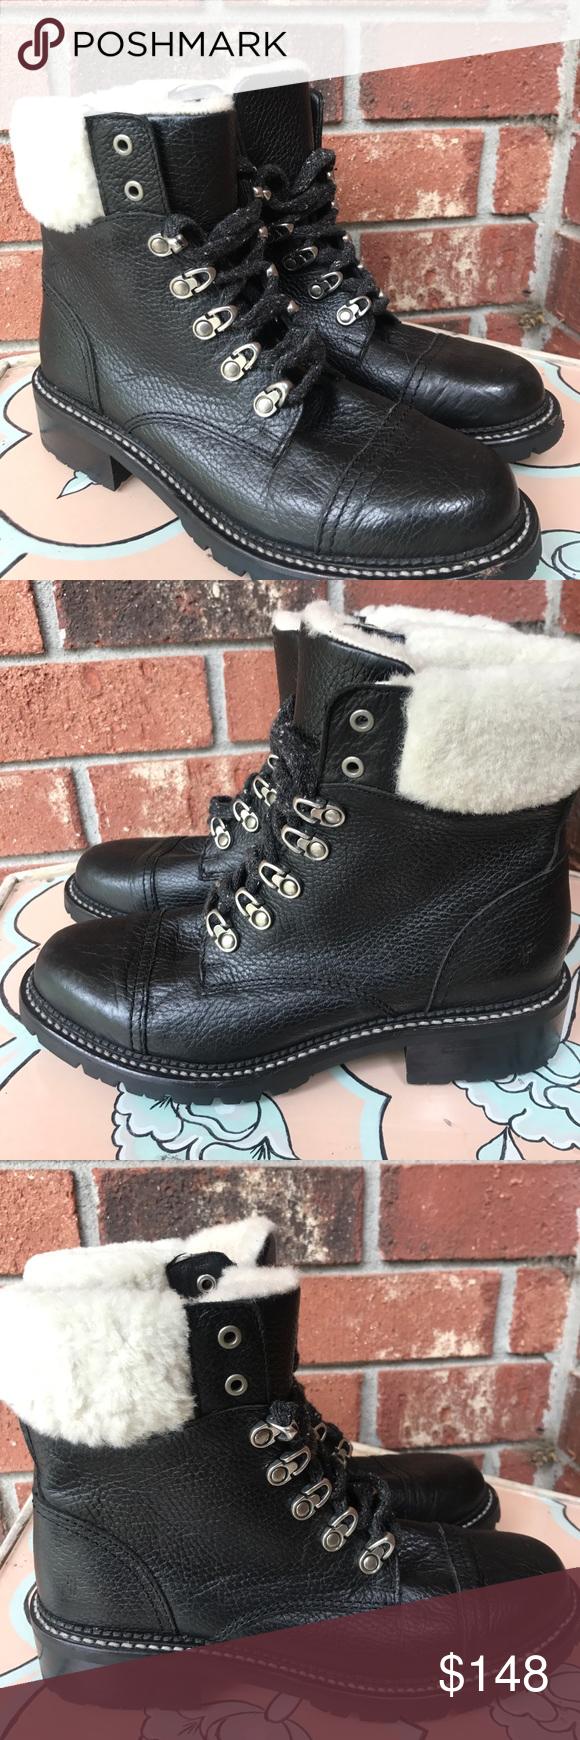 a1a53398a72 FRYE Samantha Shearling Hiker Boot- Black New, never worn. Inside ...